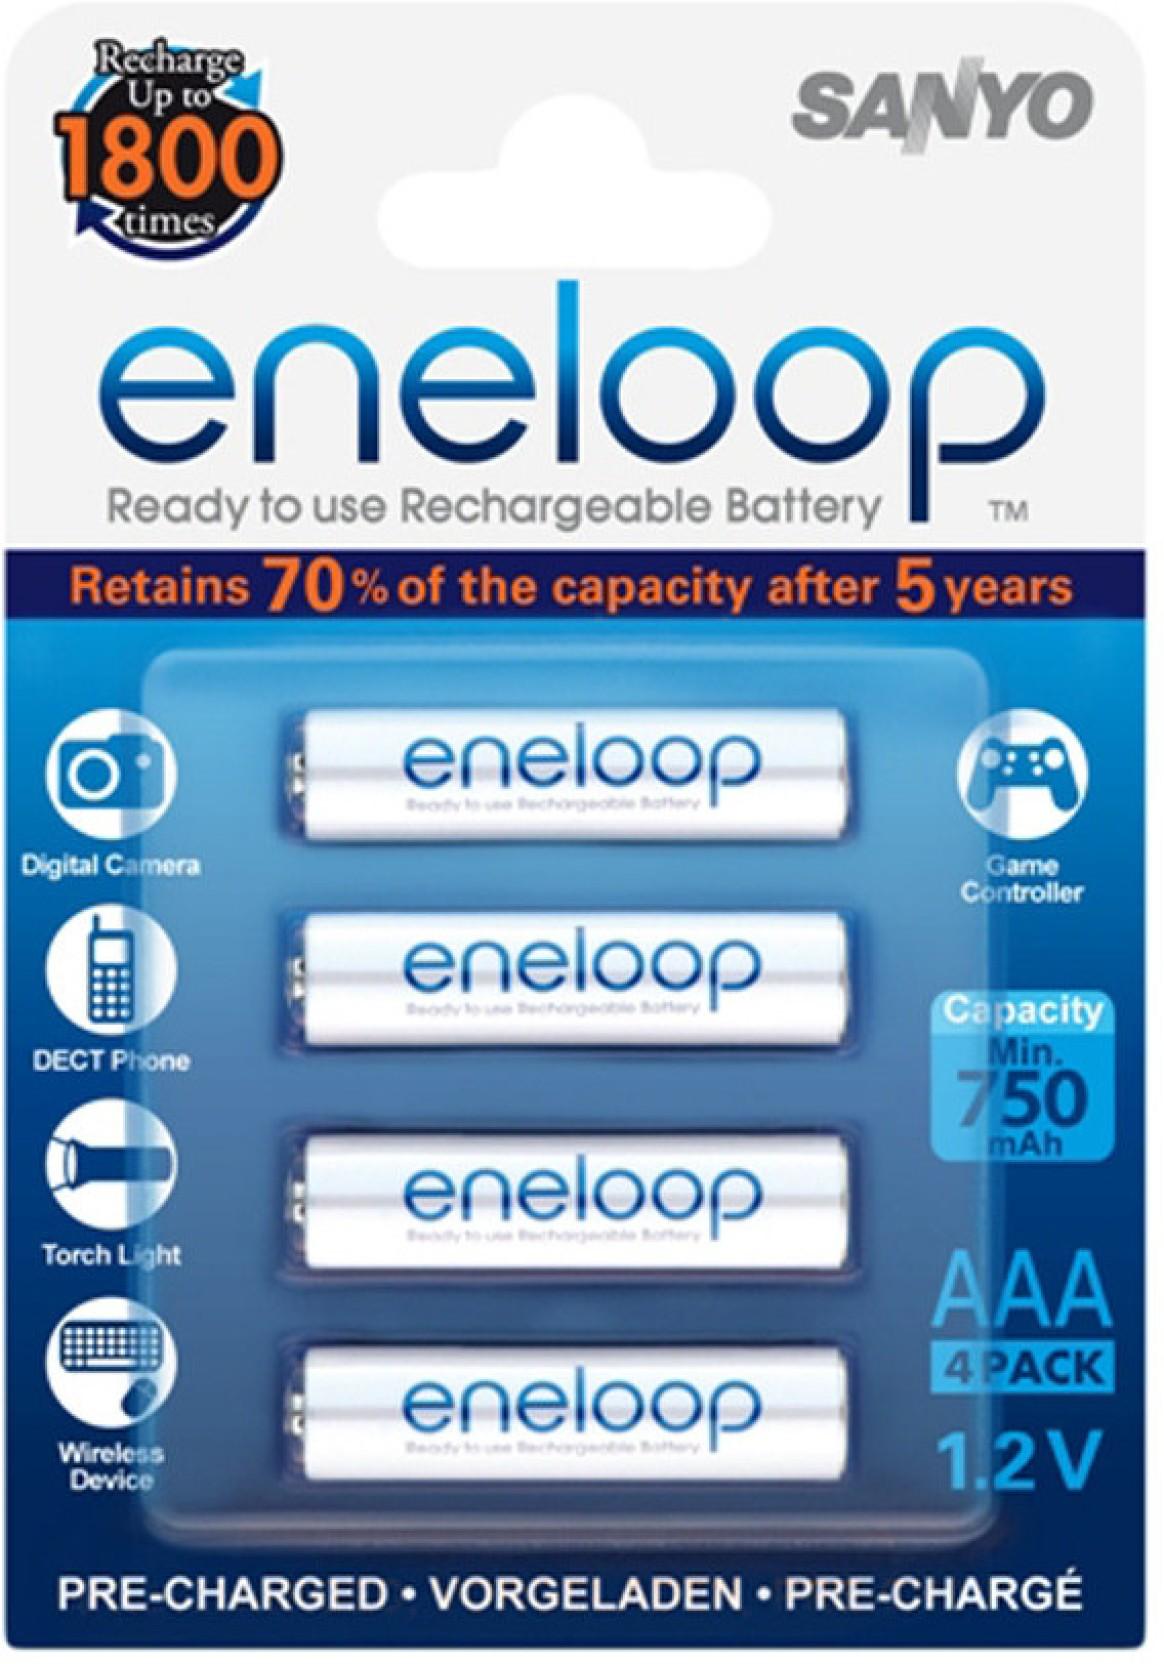 Sanyo Eneloop Hr 4utgb4btm Battery Aa 2pcs Share